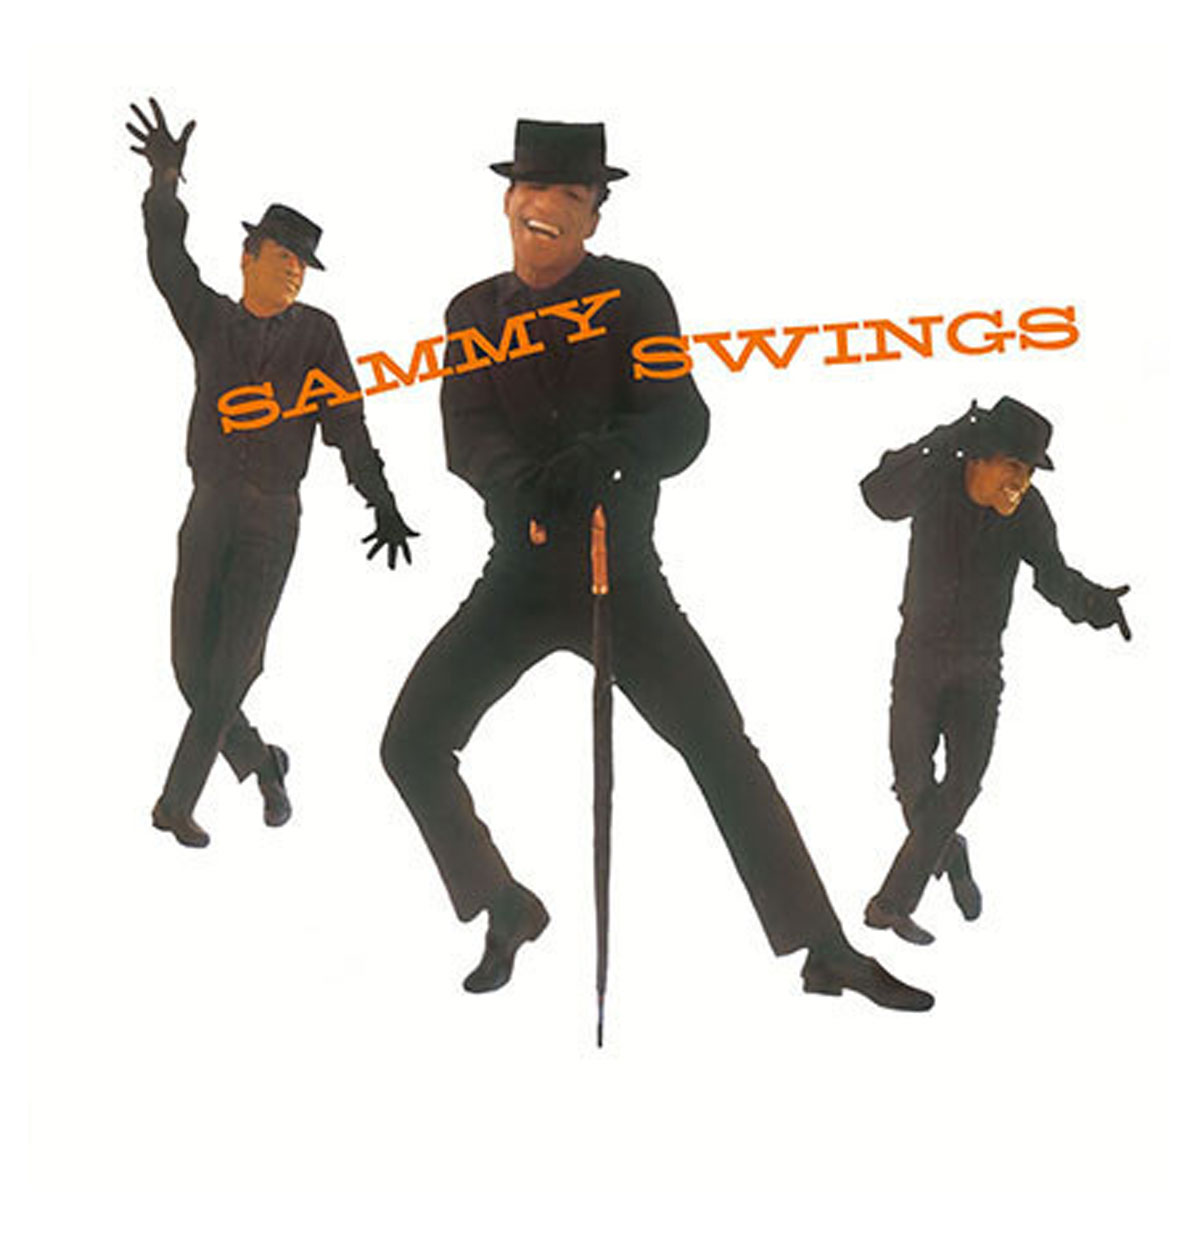 Sammy Davis Jr. - Sammy Swings LP